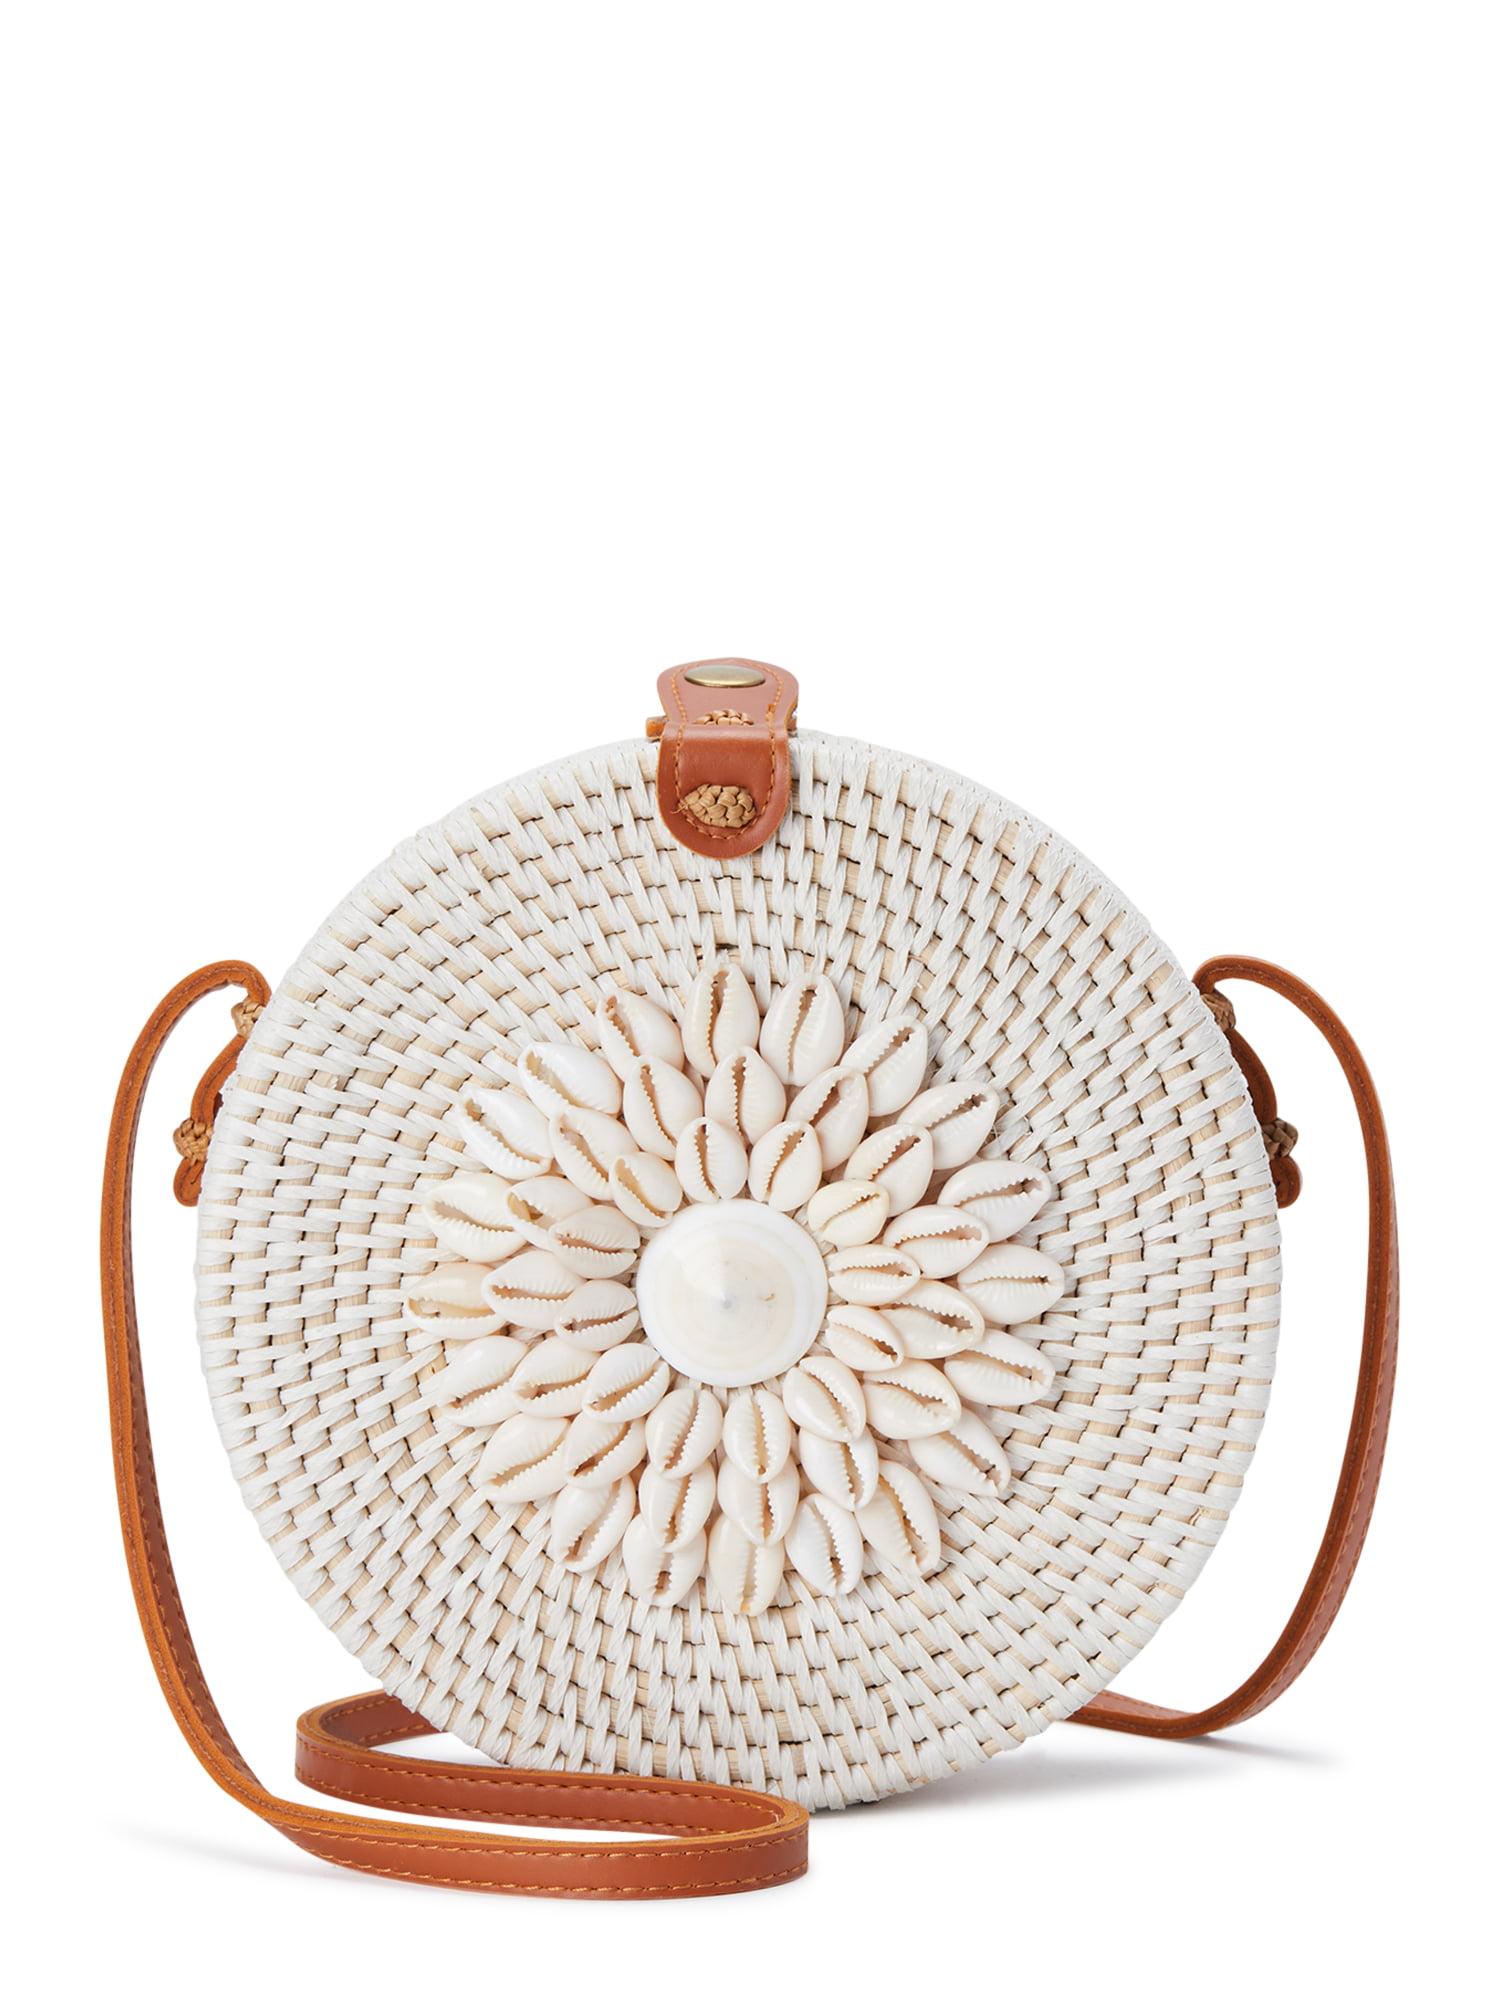 Twig & Arrow Seashell Crossbody Bag with Snap Closure